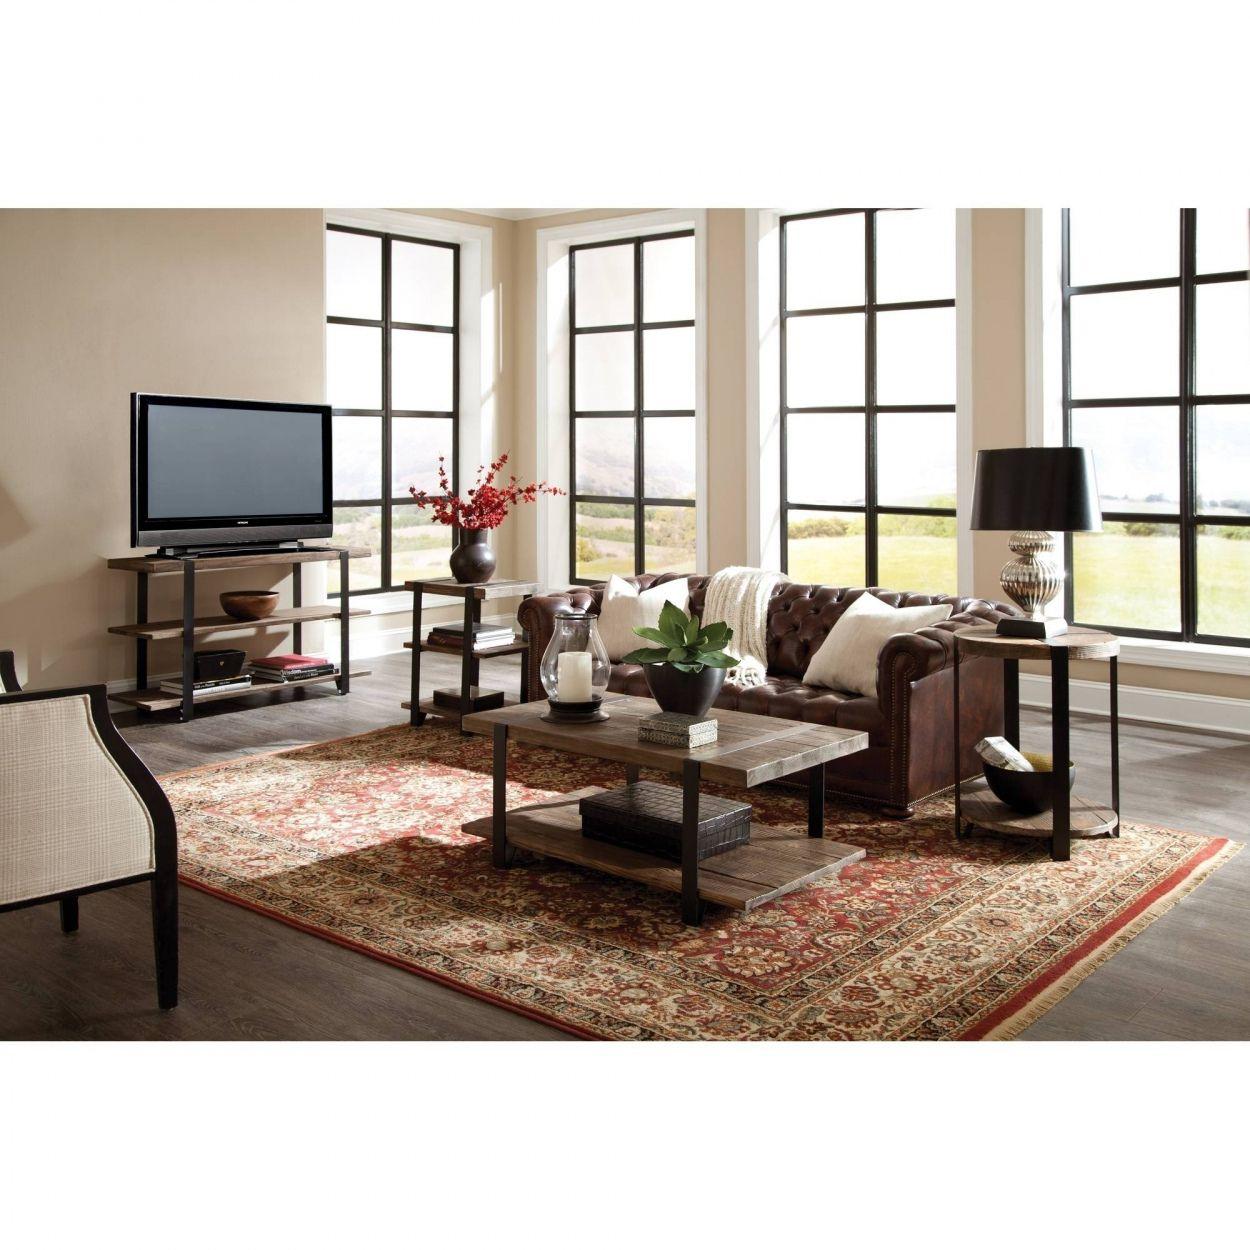 Superbe Custom Furniture Manufacturers   Best Furniture Gallery Check More At  Http://searchfororangecountyhomes.